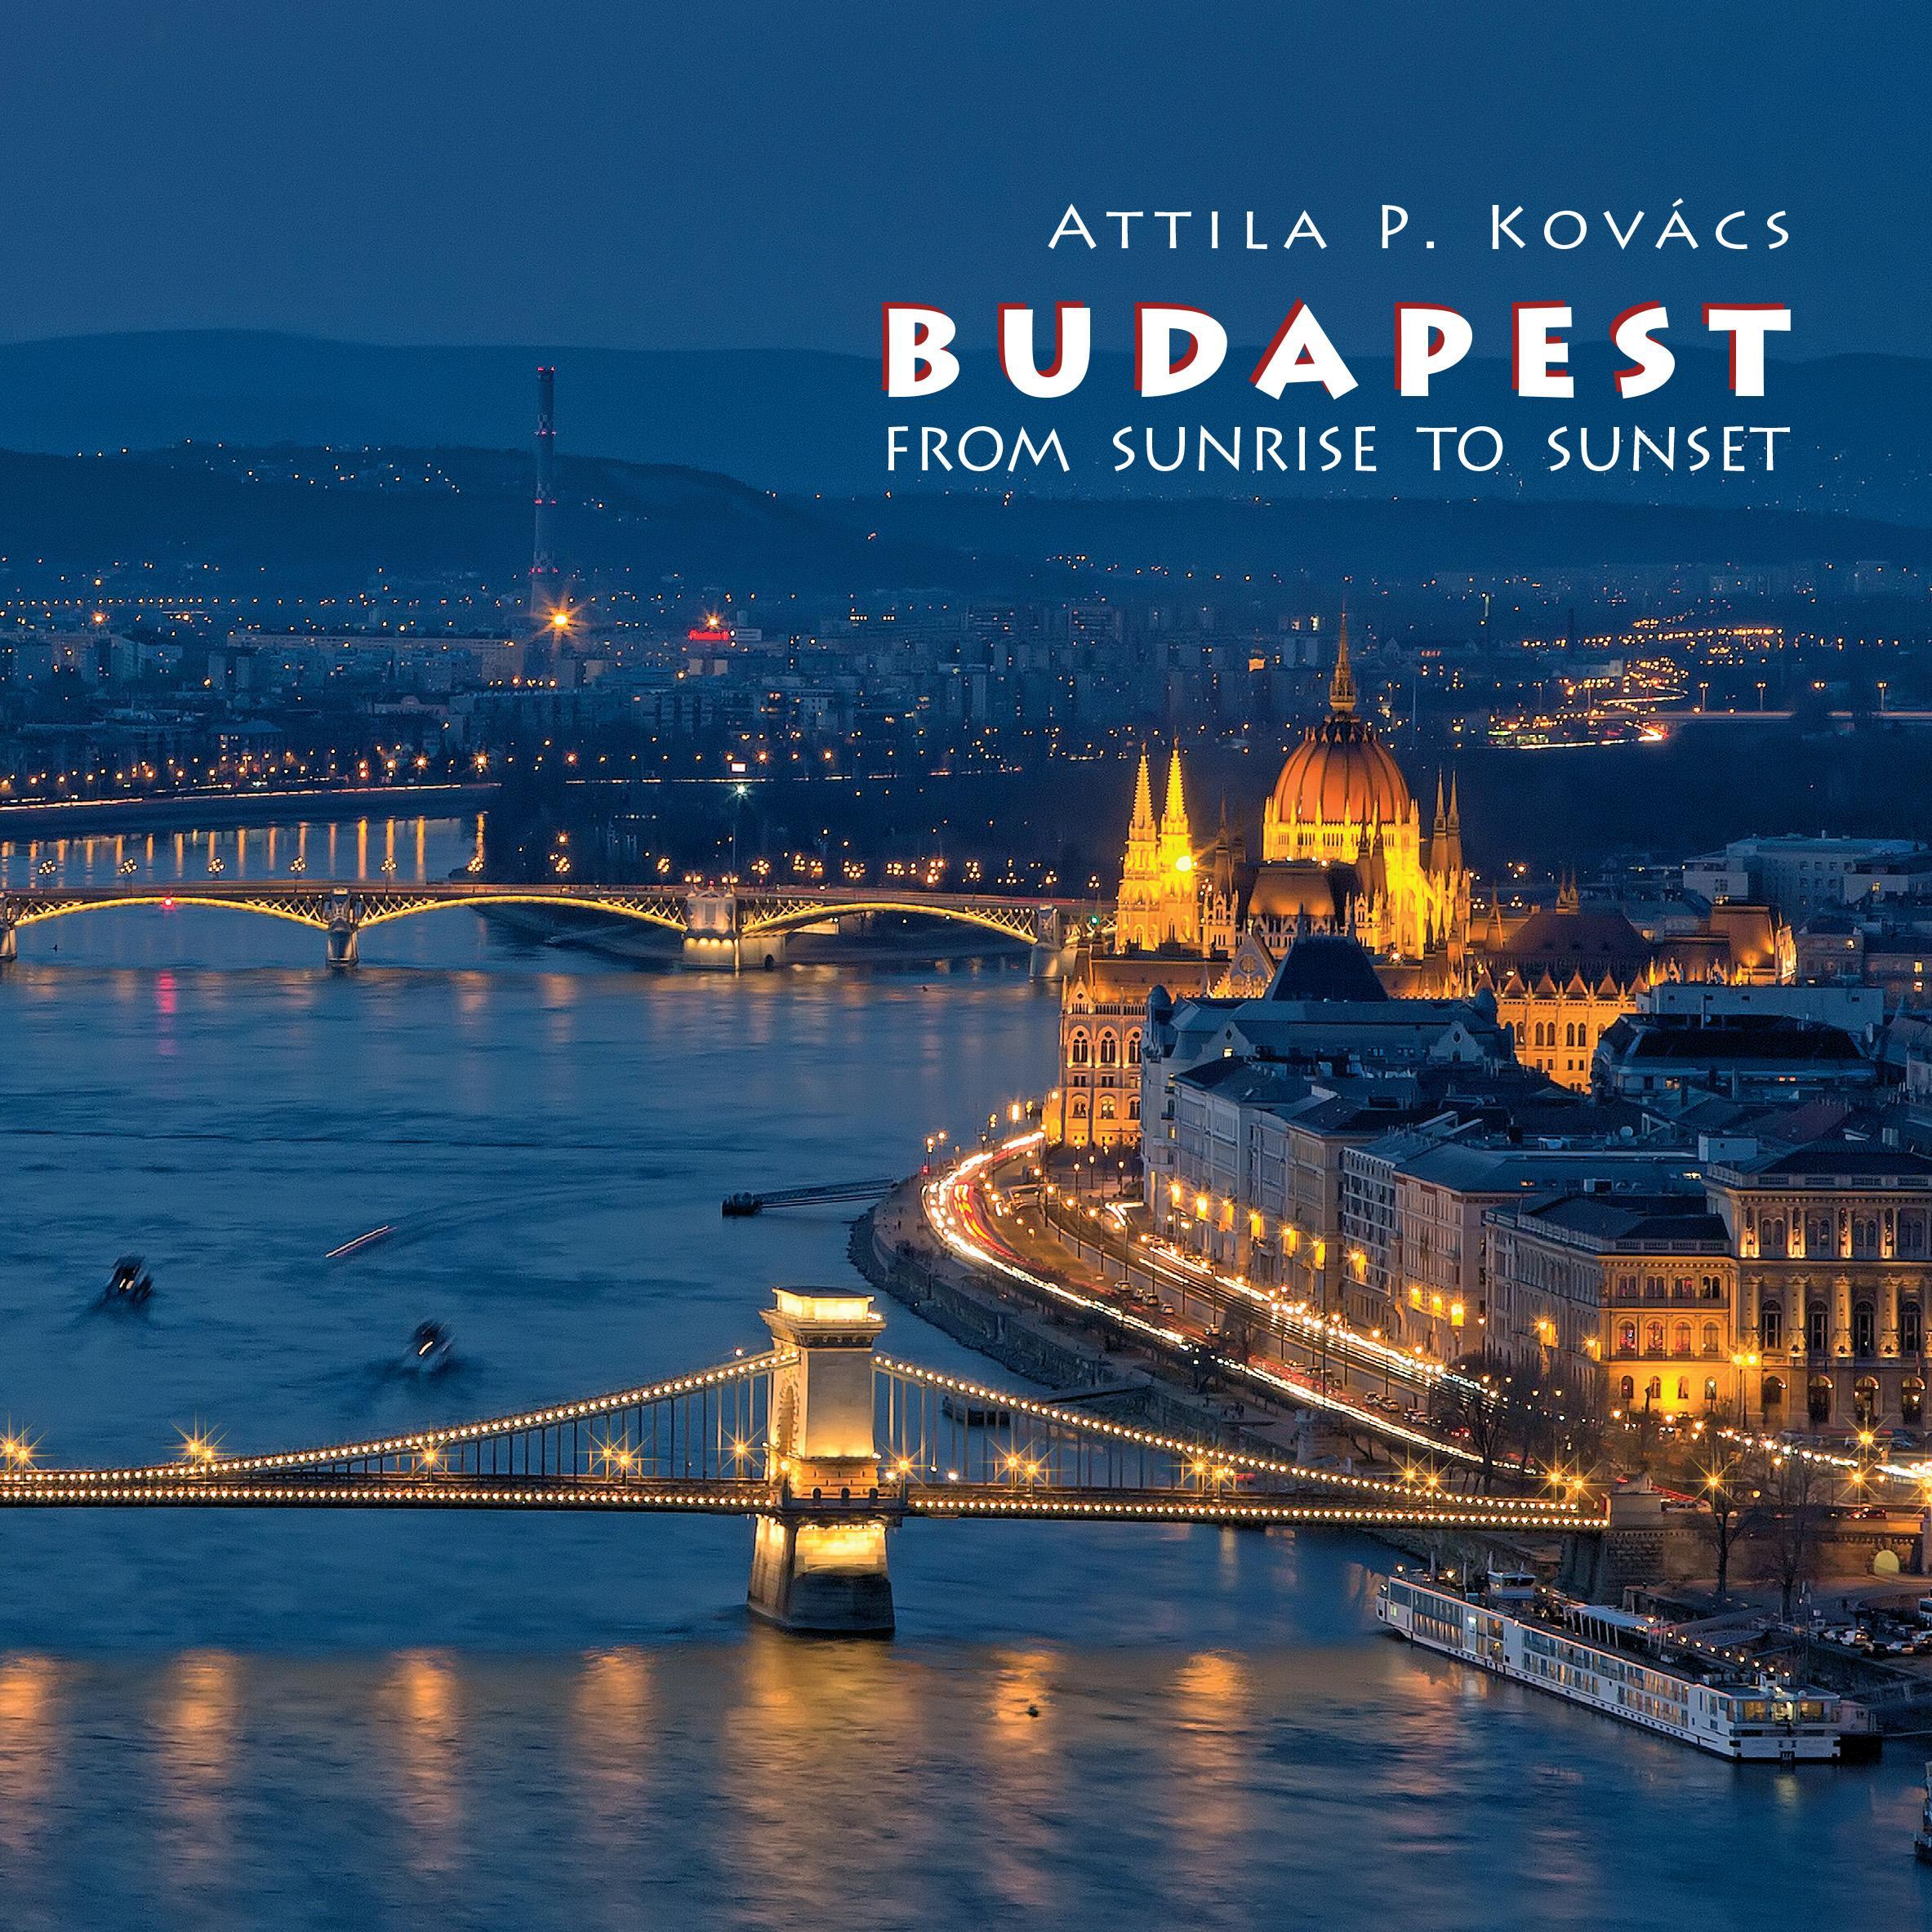 BUDAPEST FOTÓALBUM 2017 (ANGOL) - NAPKELTÉTŐL NAPNYUGTÁIG